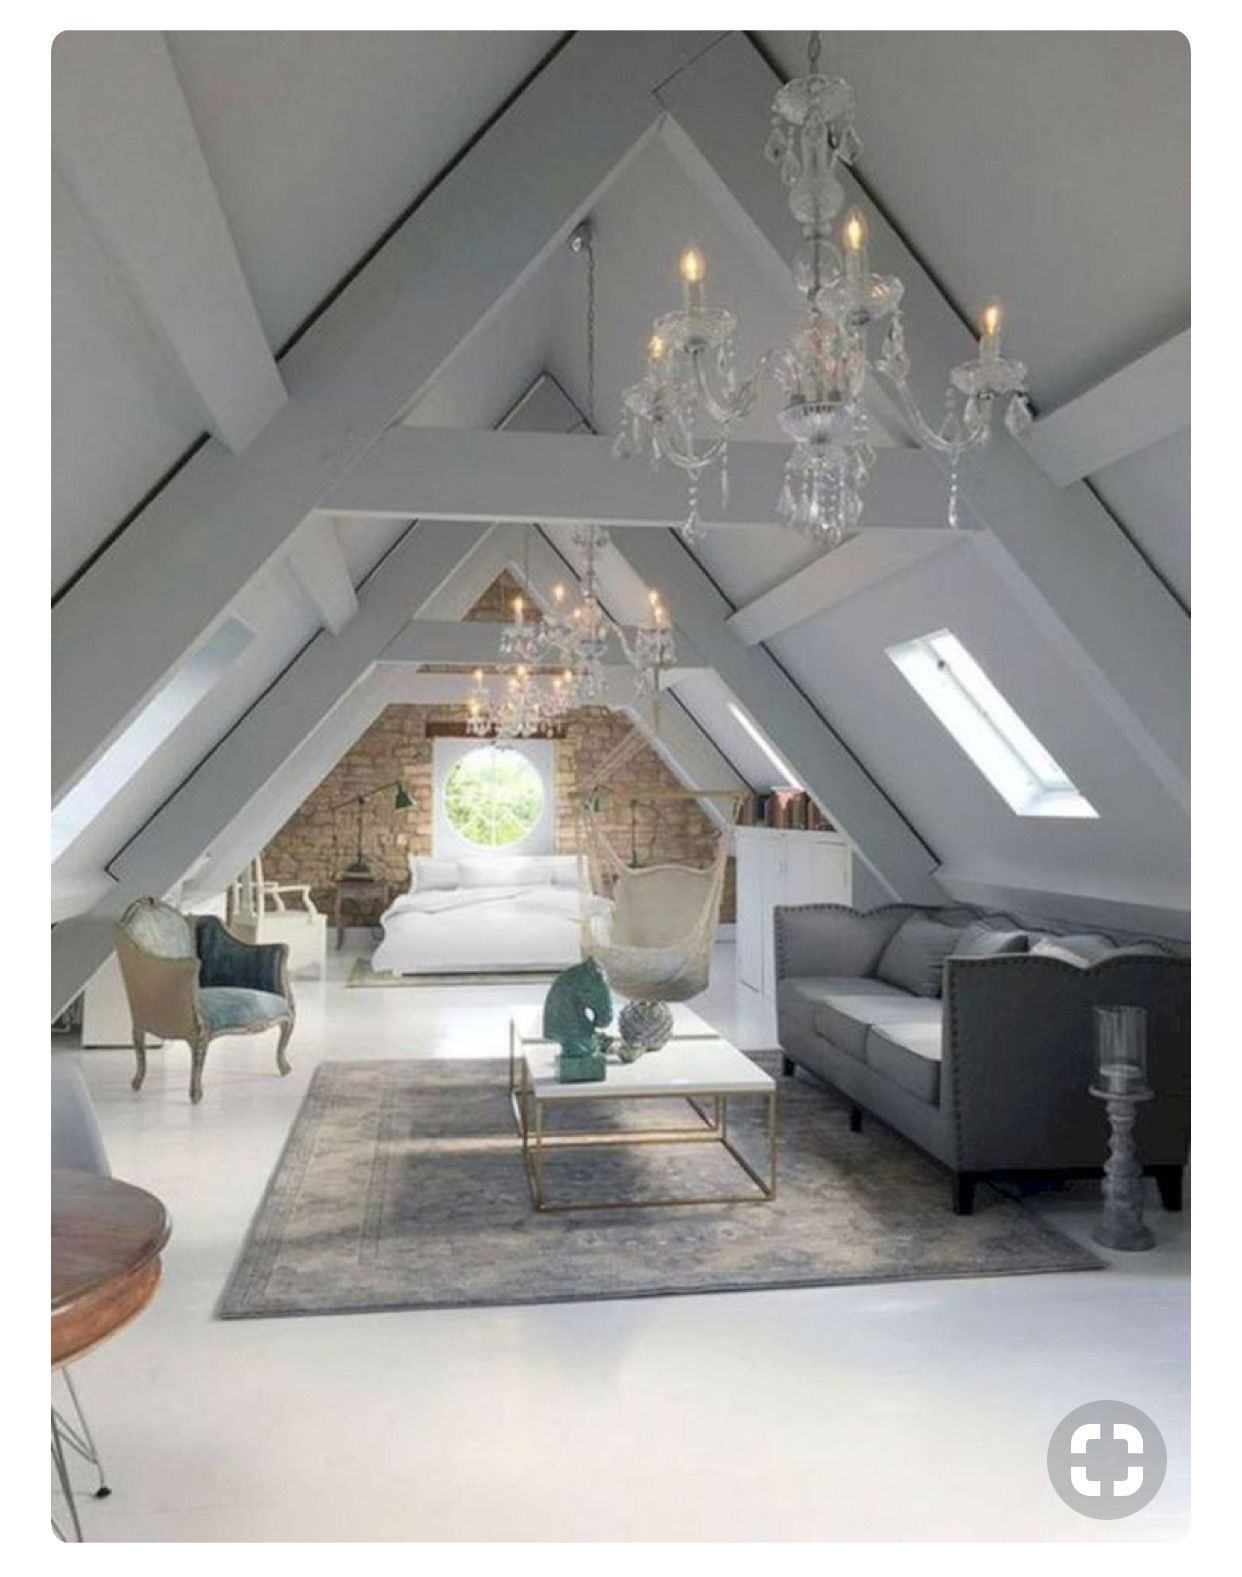 projekte wohnen dachboden loft dachzimmer loft schlafzimmer loft umbauten schlafzimmerdesign schlafzimmerdeko schlafzimmer ideen - Schlafzimmer Ideen Dachboden